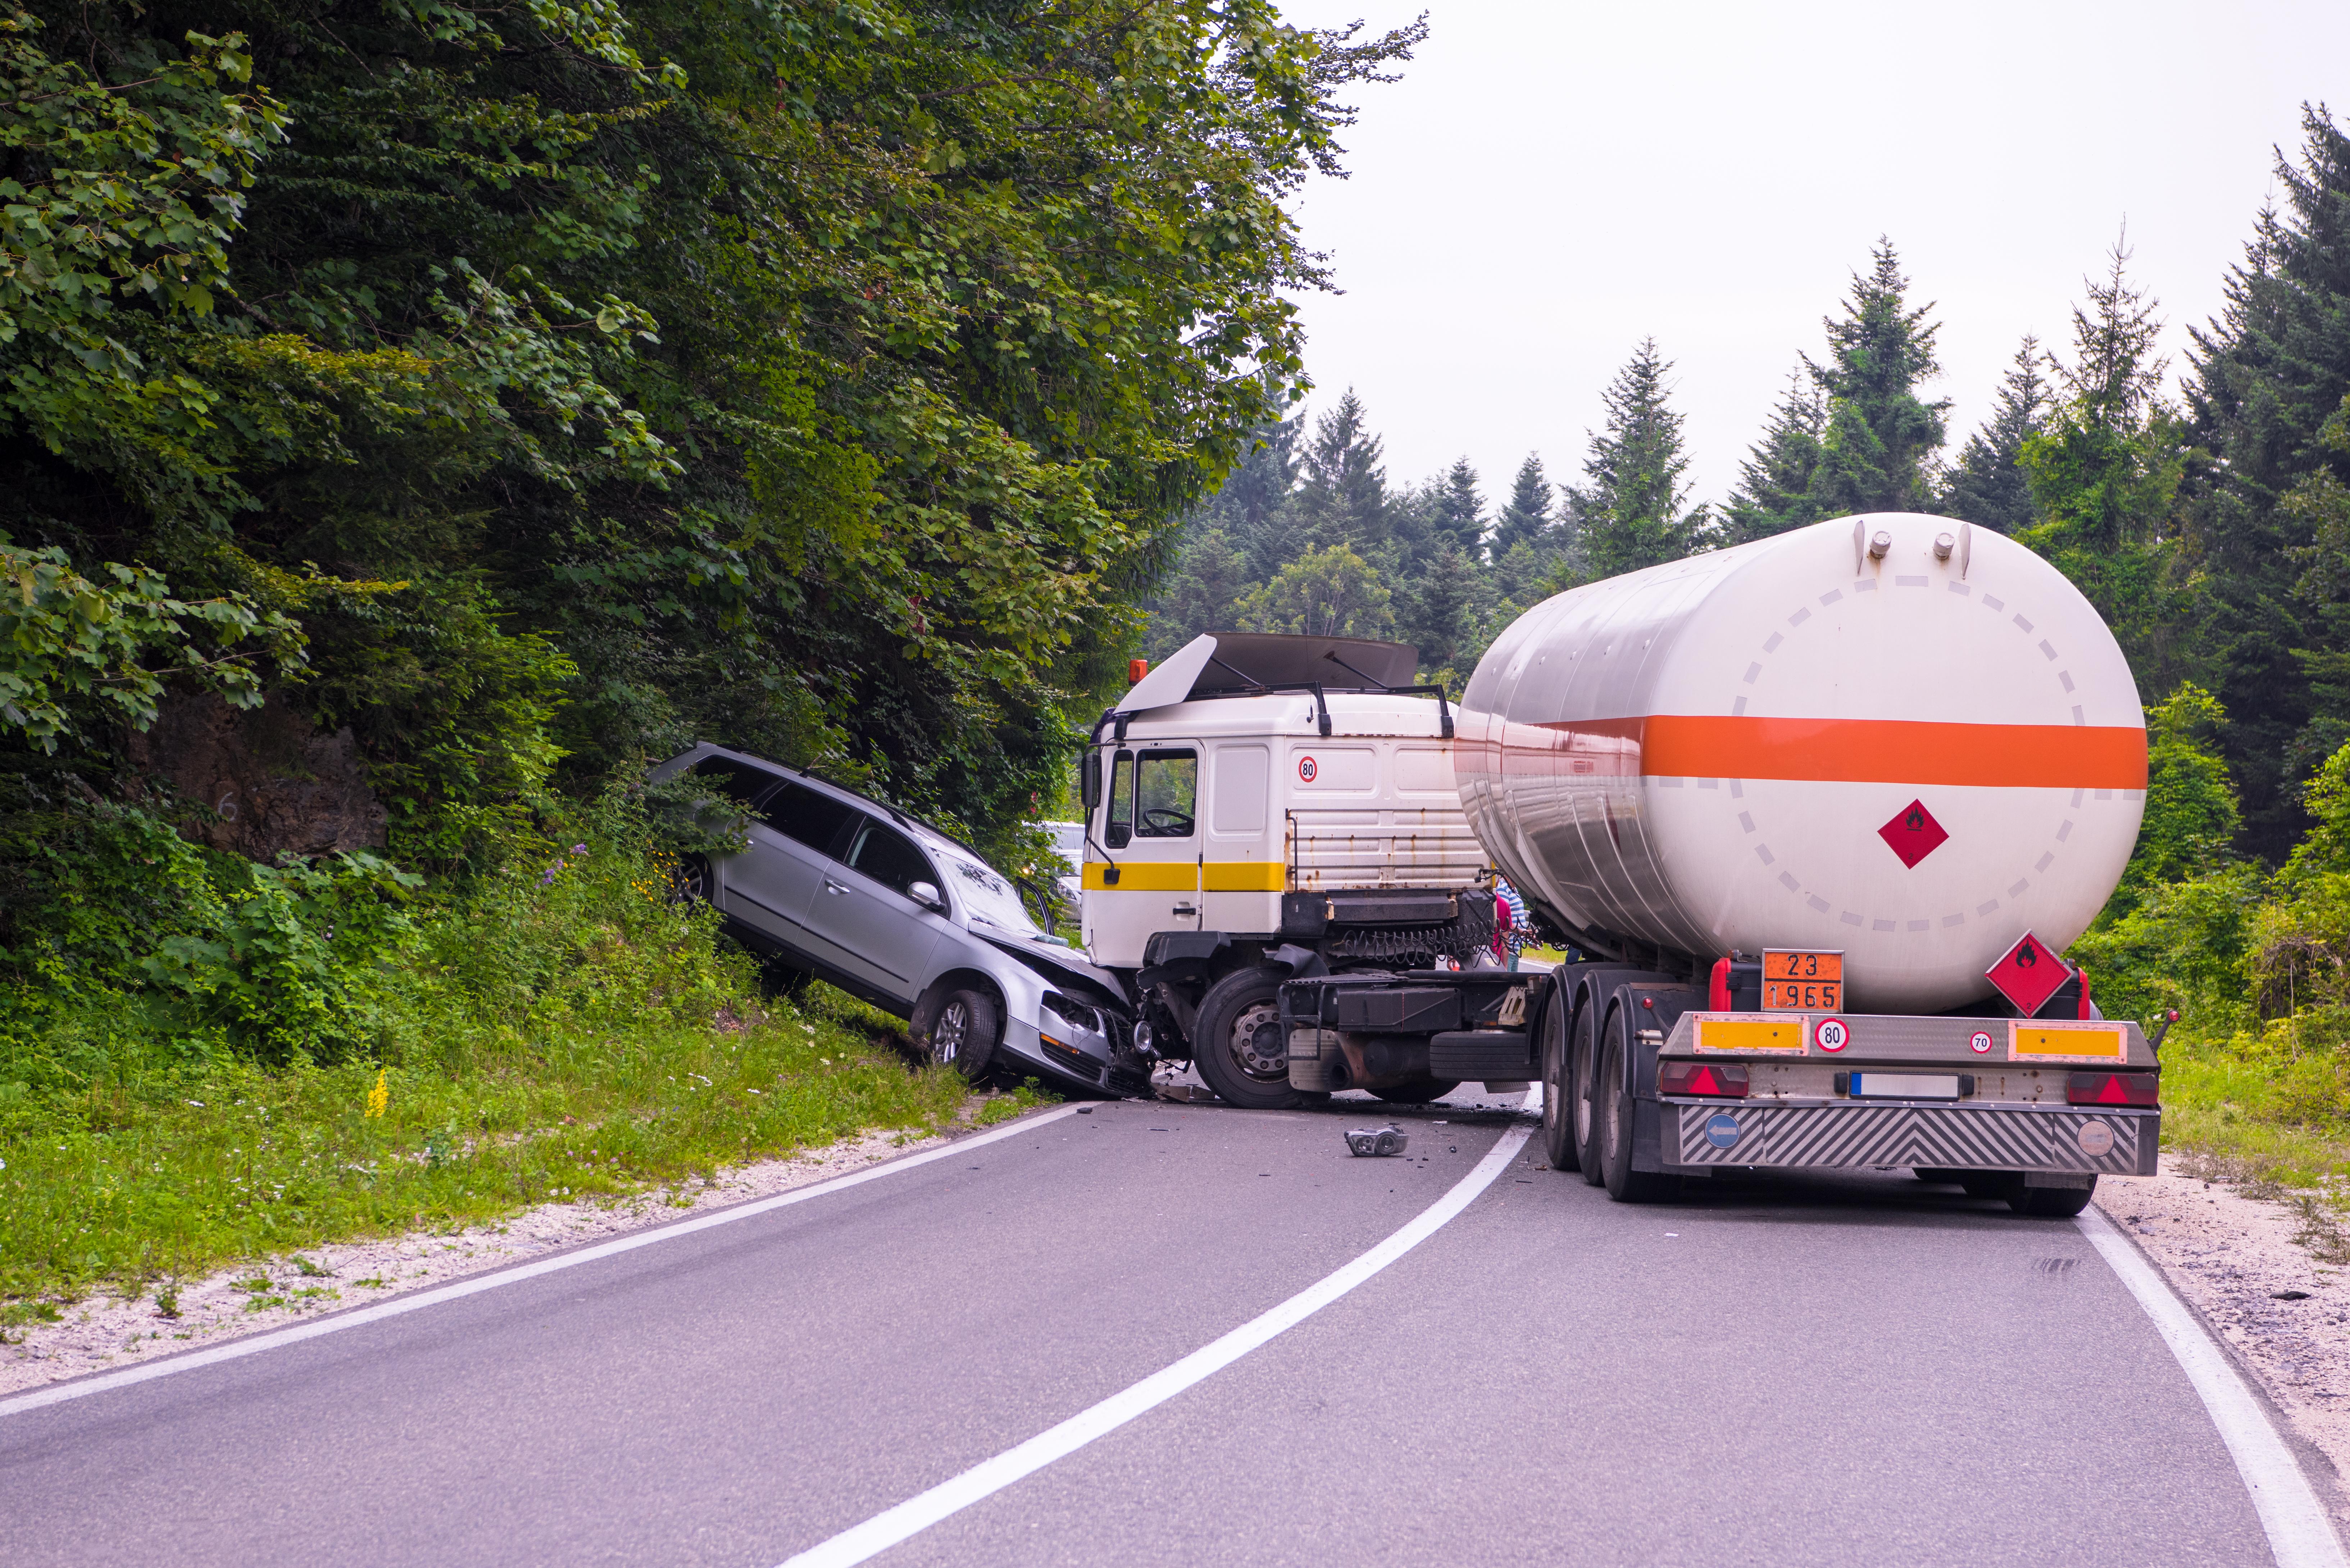 Traffic accident  Truck and Car crash ac